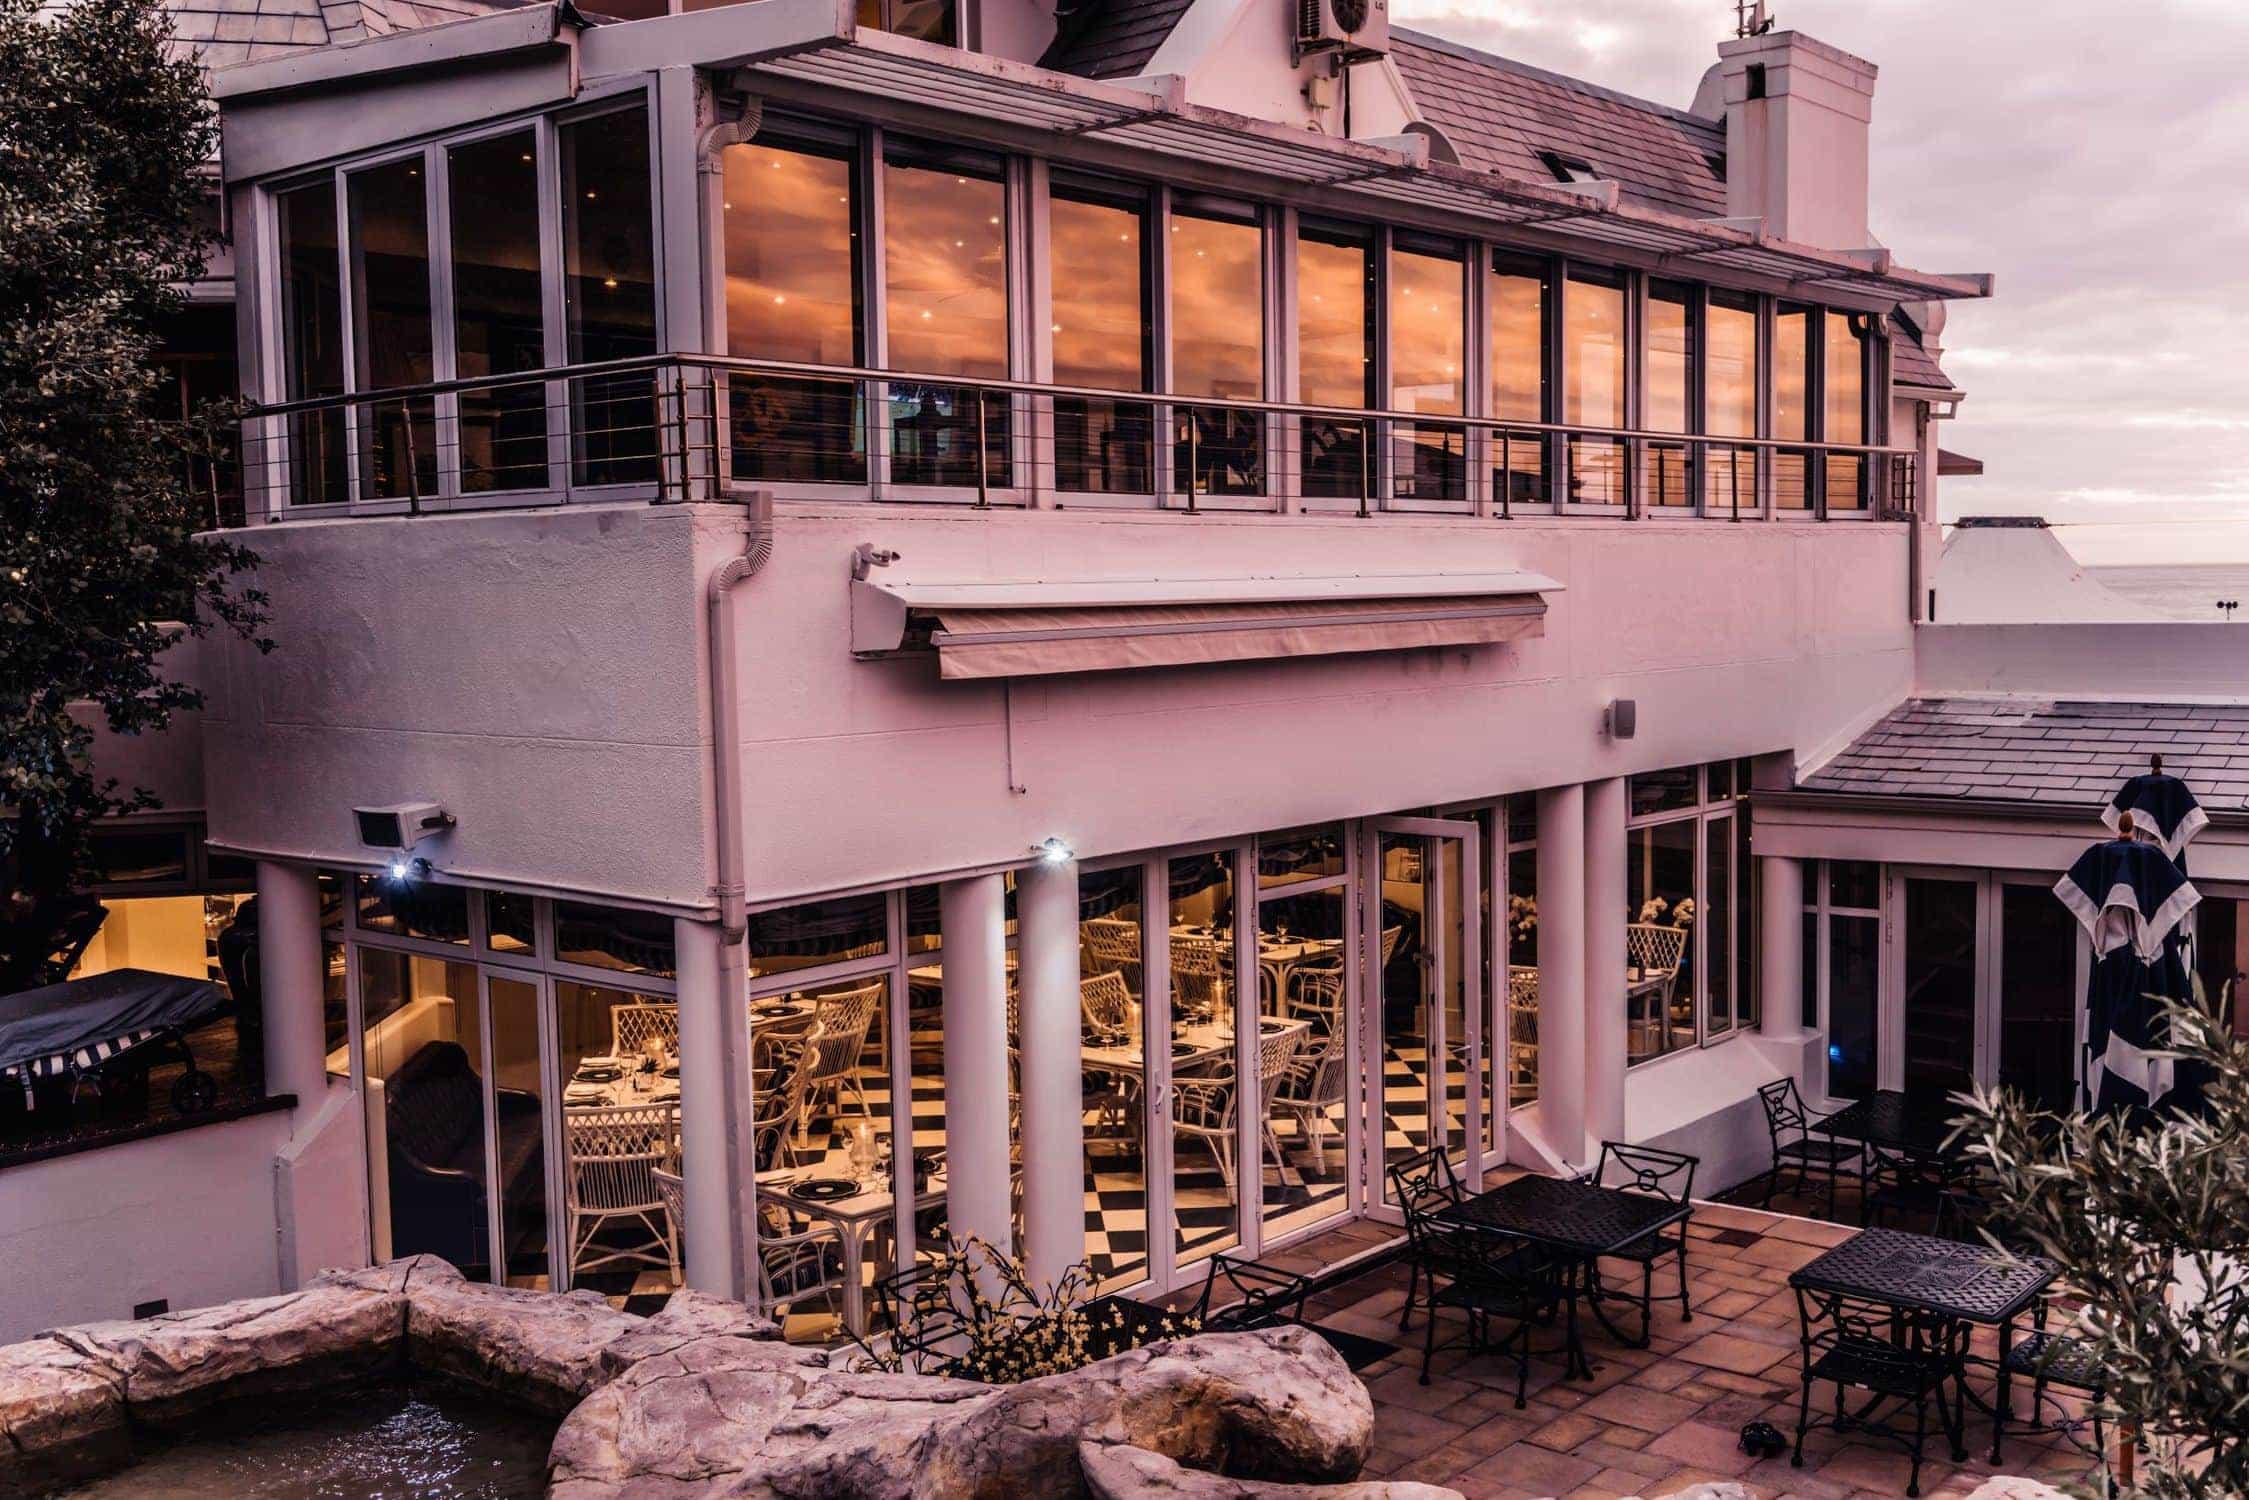 12 apostles hotel spa Café Grill restaurant